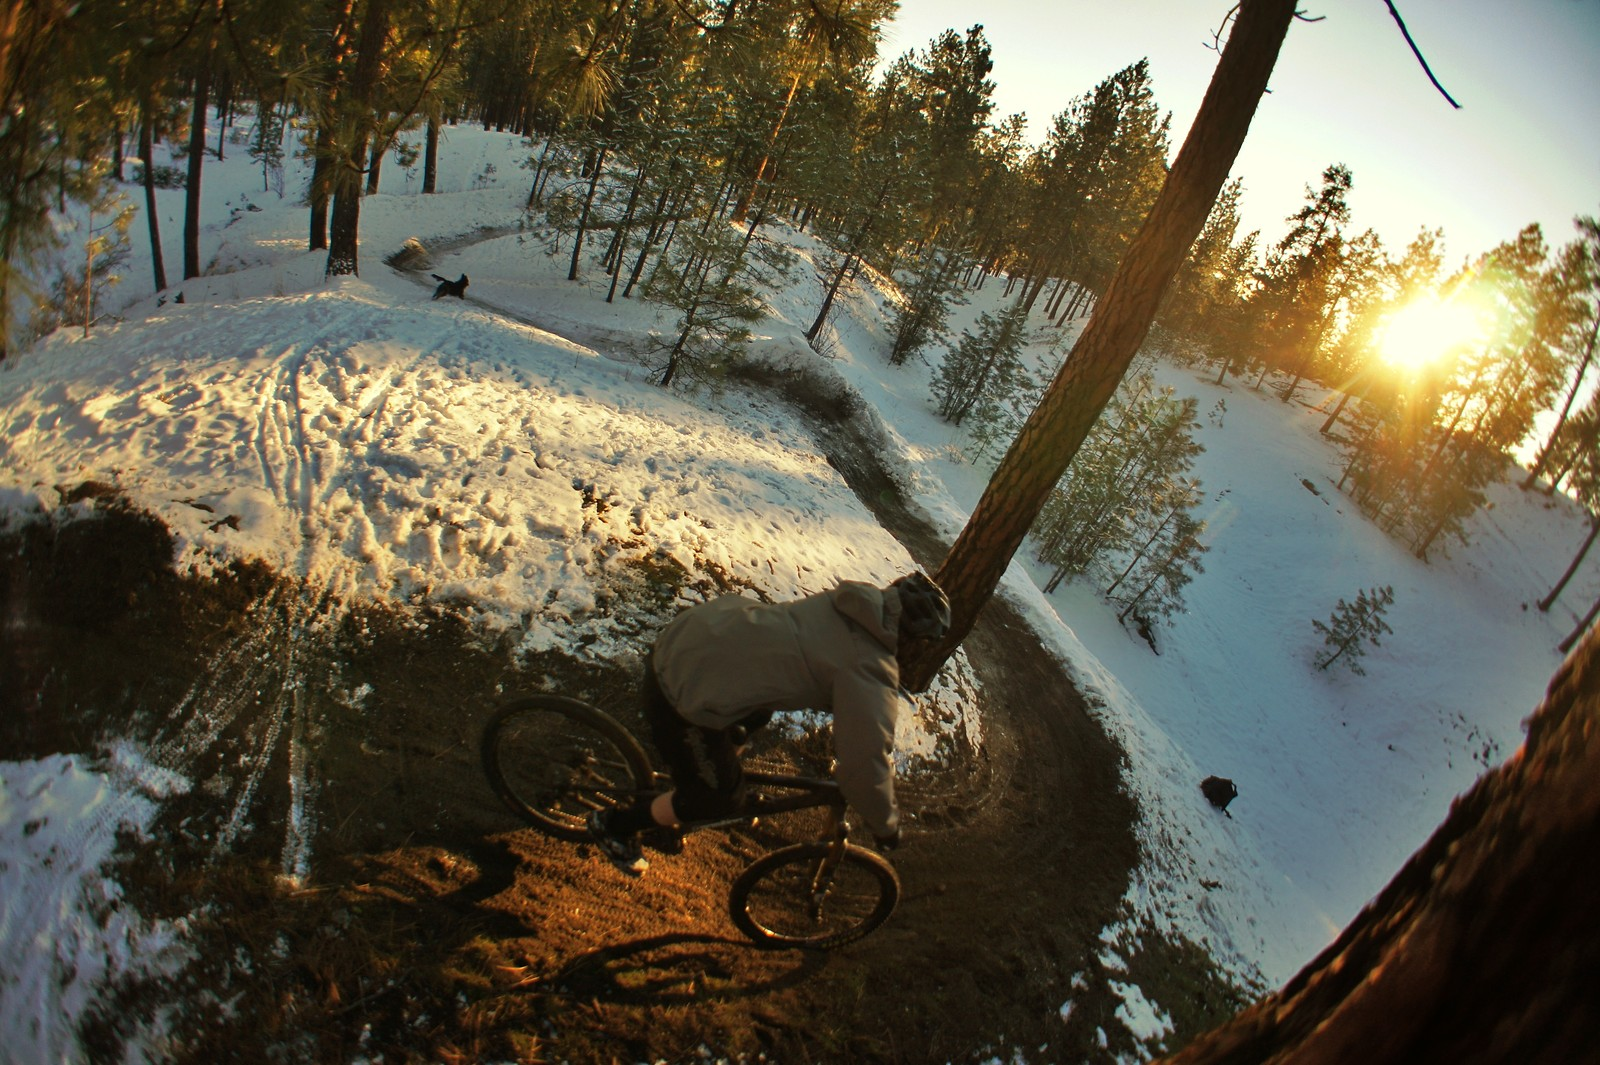 Winter Shred - Skye_Schillhammer - Mountain Biking Pictures - Vital MTB